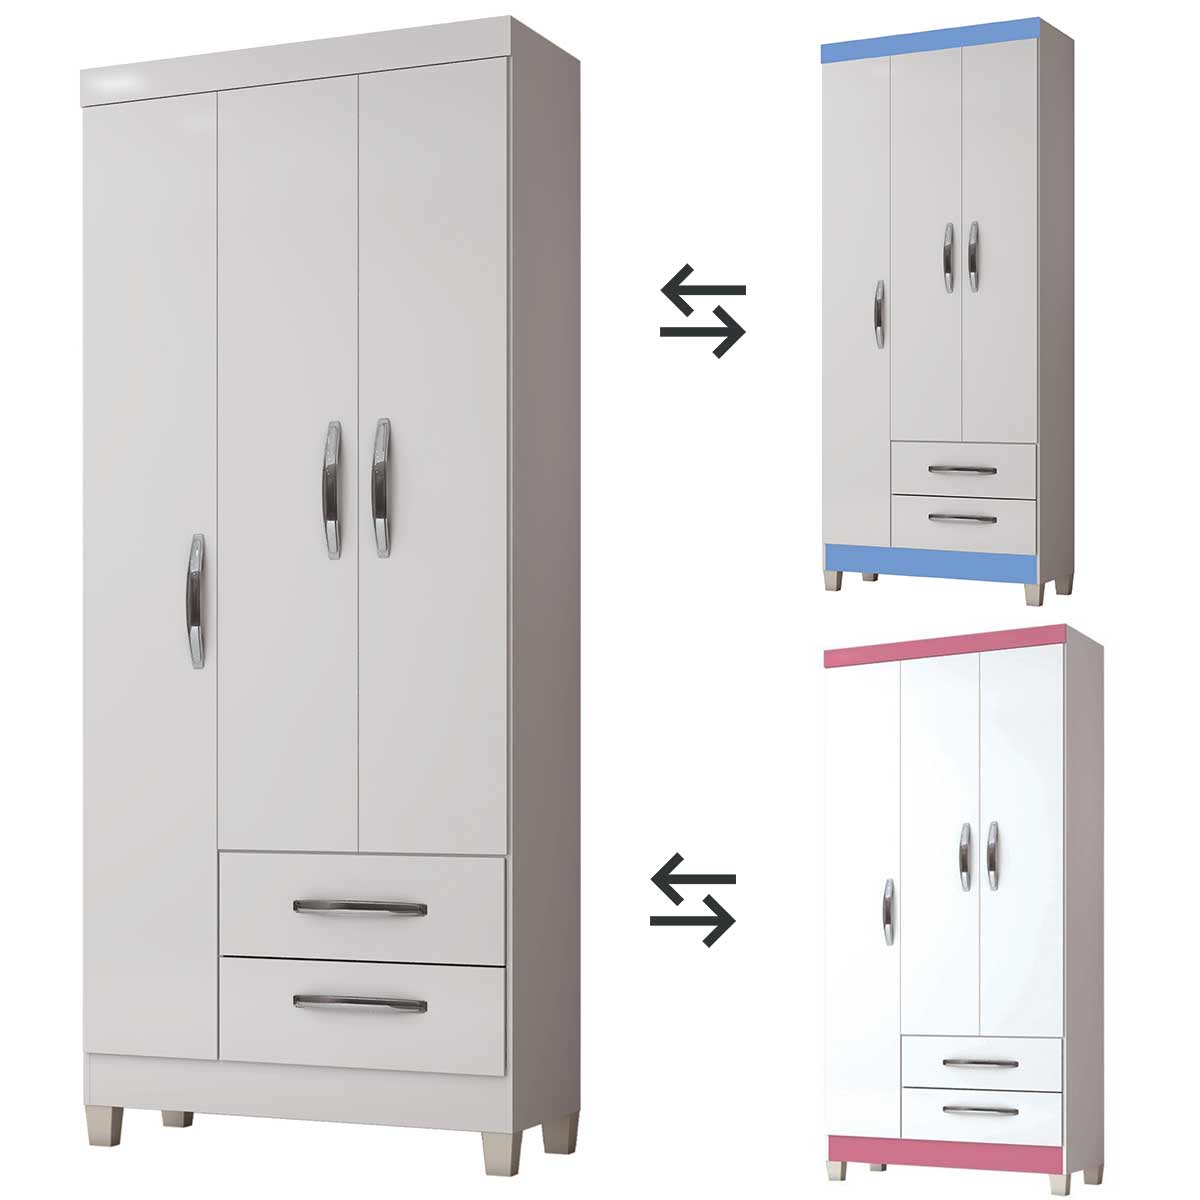 Guarda-Roupa Módena 3 Portas Branco Flex Incorplac